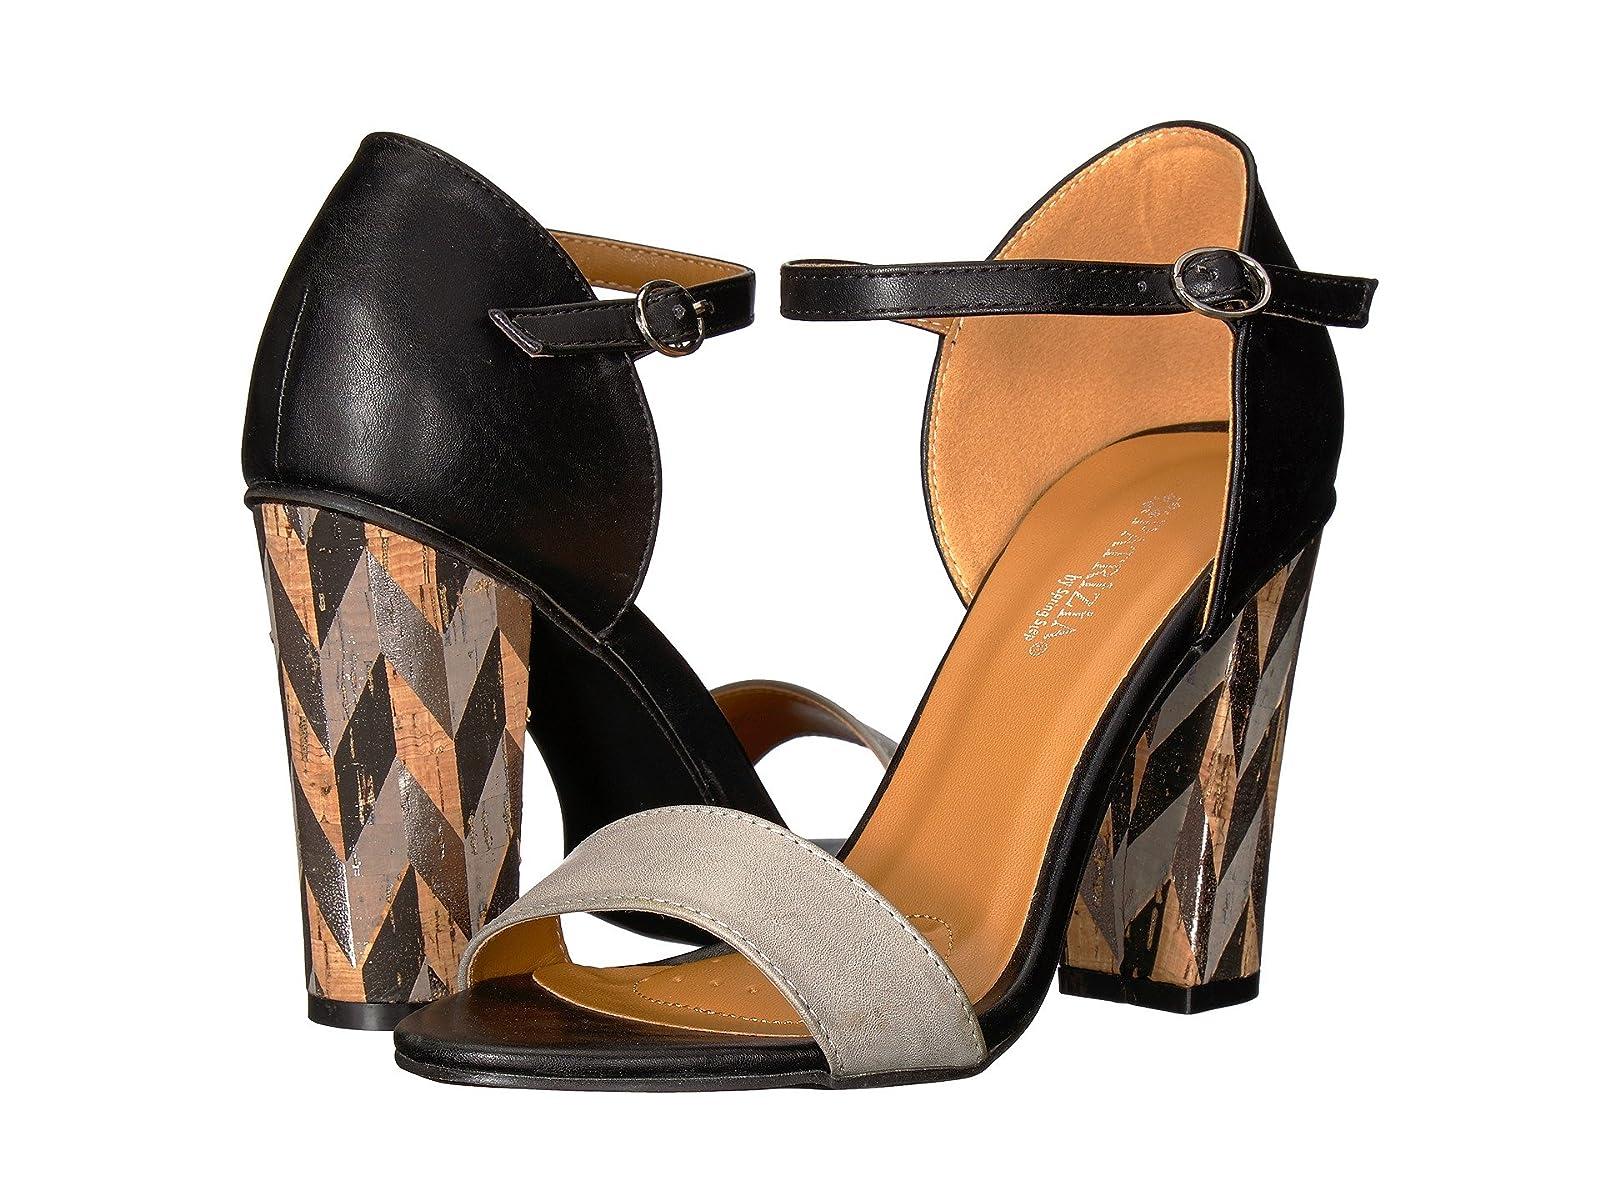 PATRIZIA HajnaCheap and distinctive eye-catching shoes